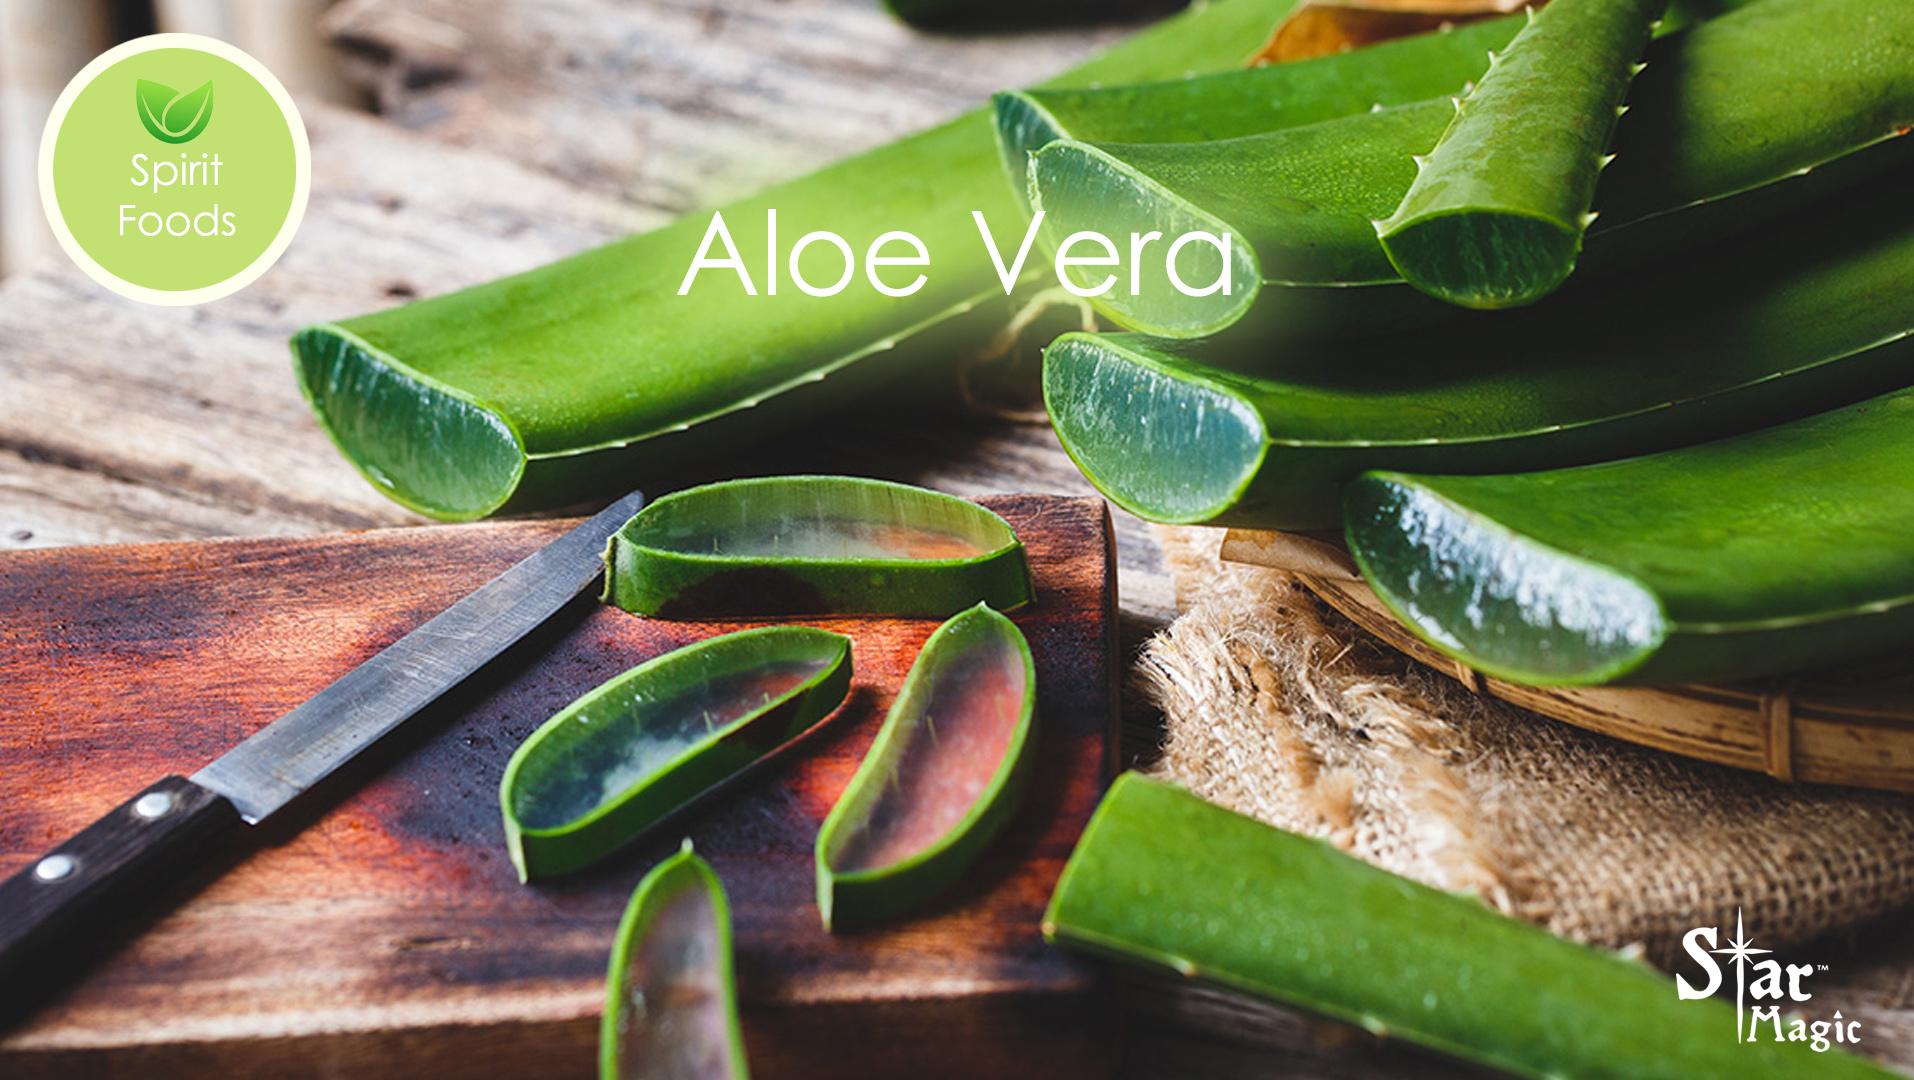 Spirit Food – Aloe Vera